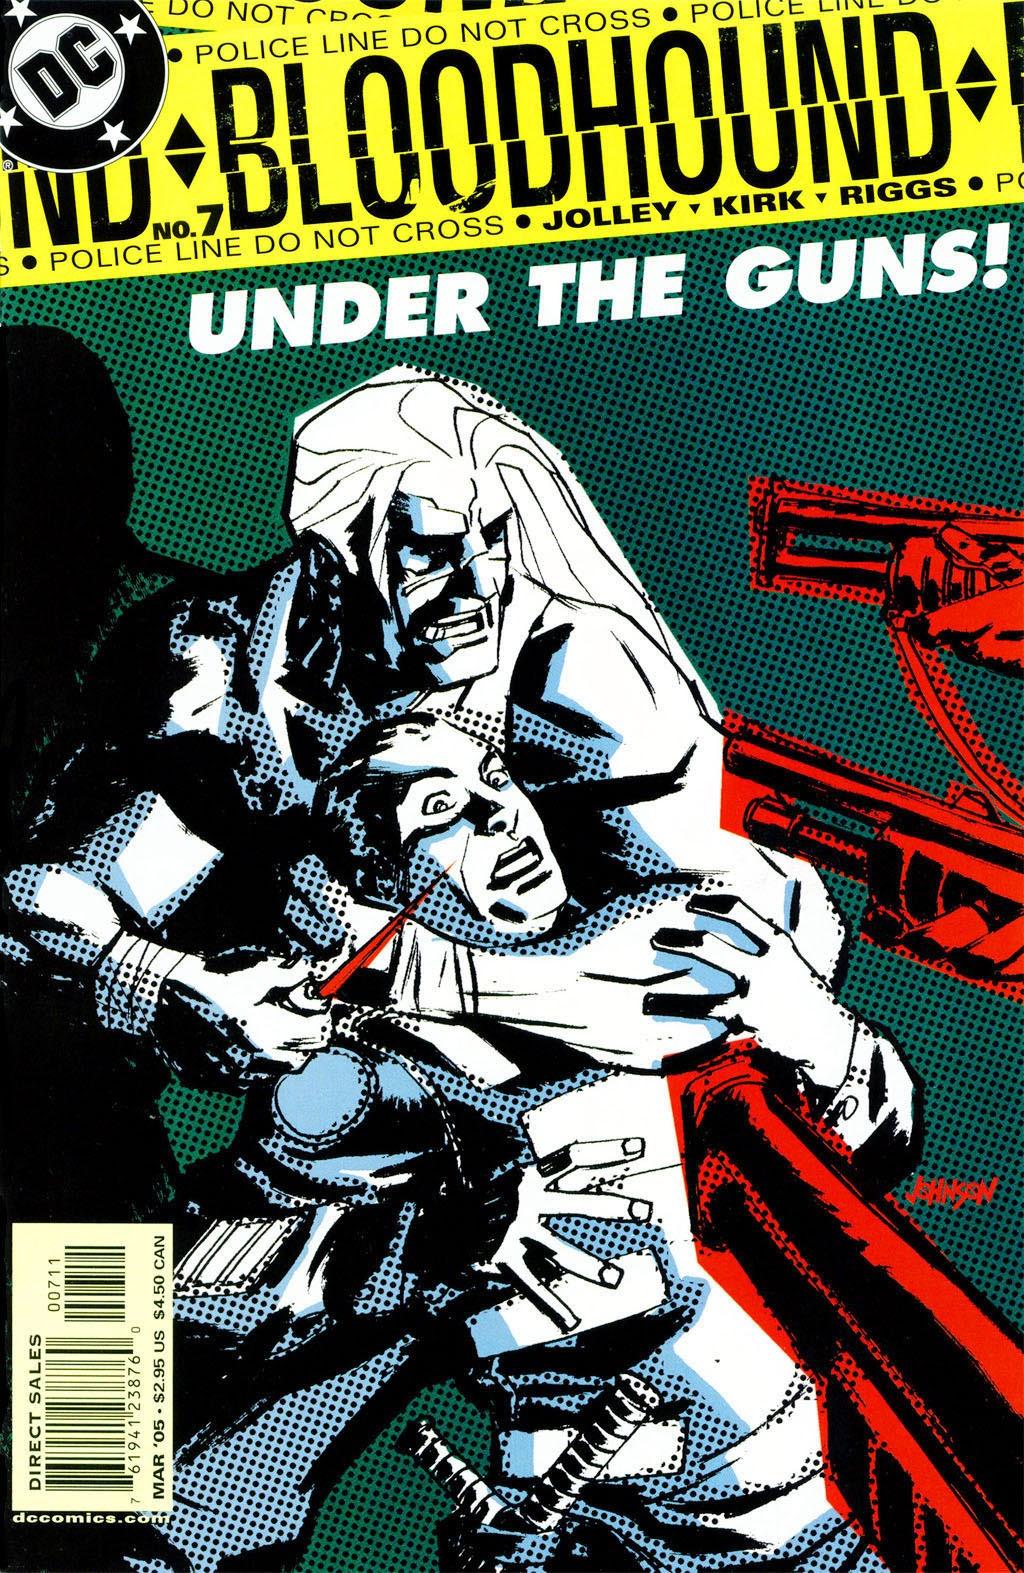 Bloodhound issue 7 - Page 1